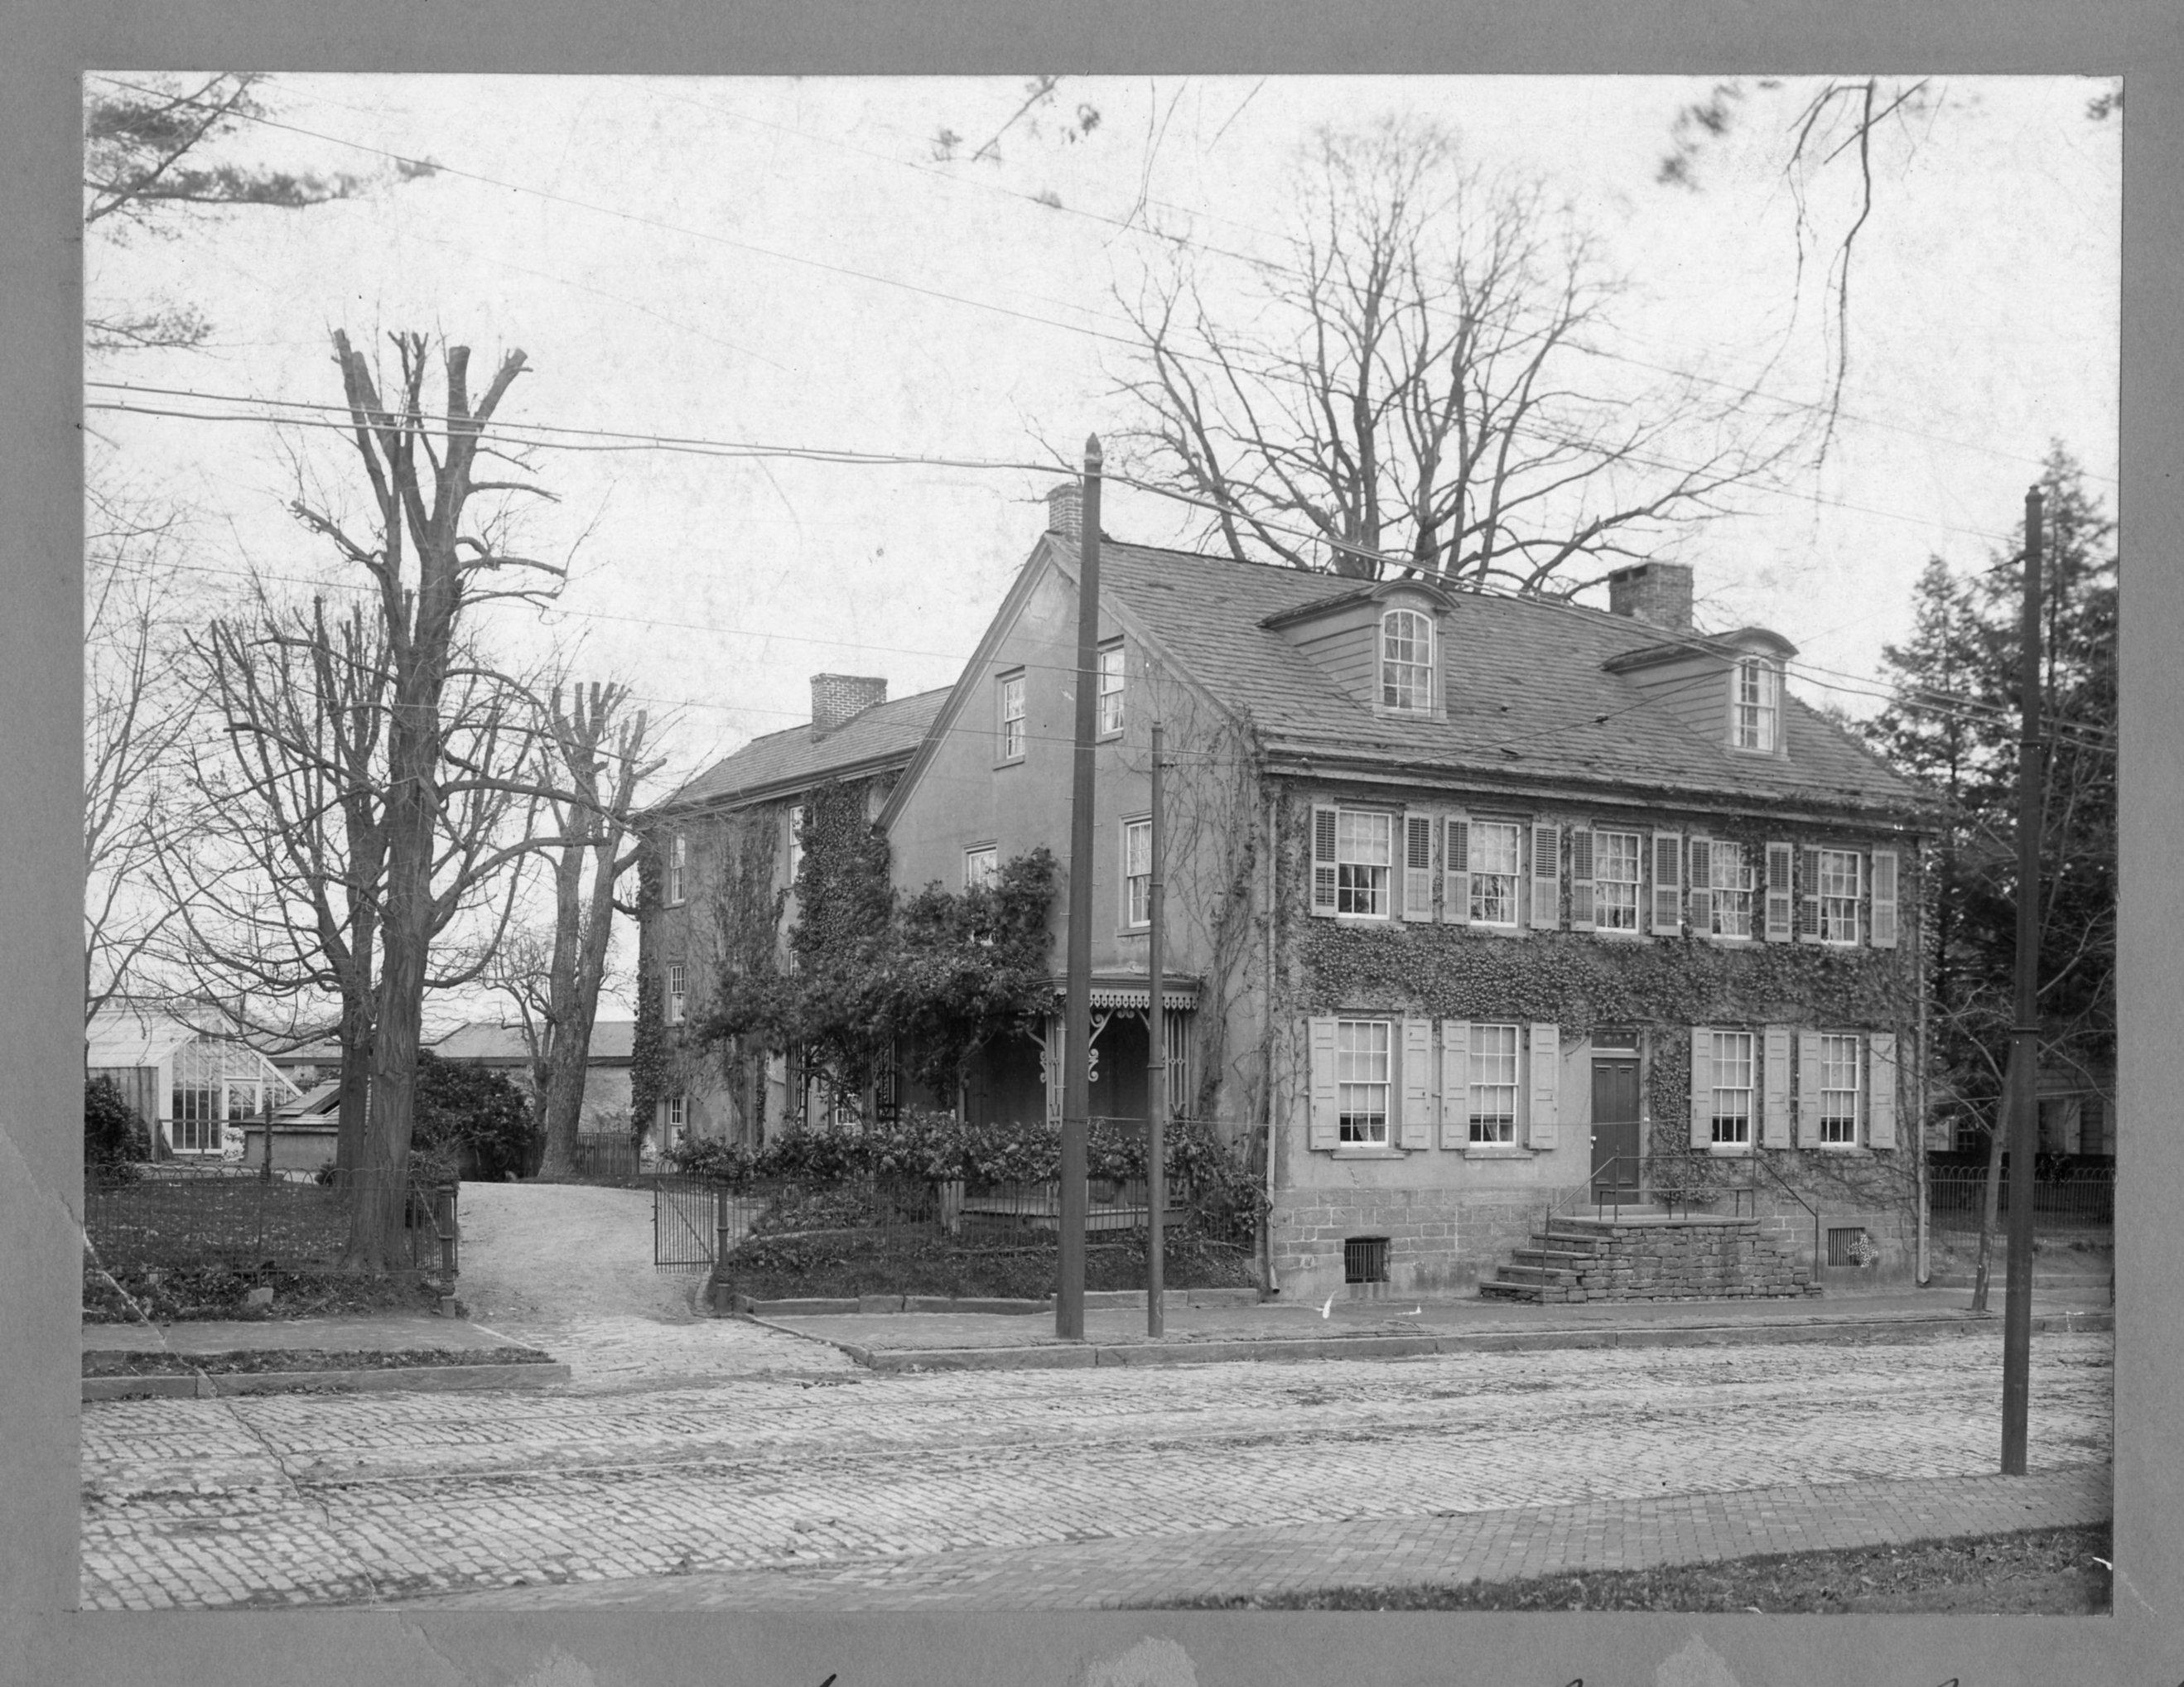 Hesser House, circa 1900